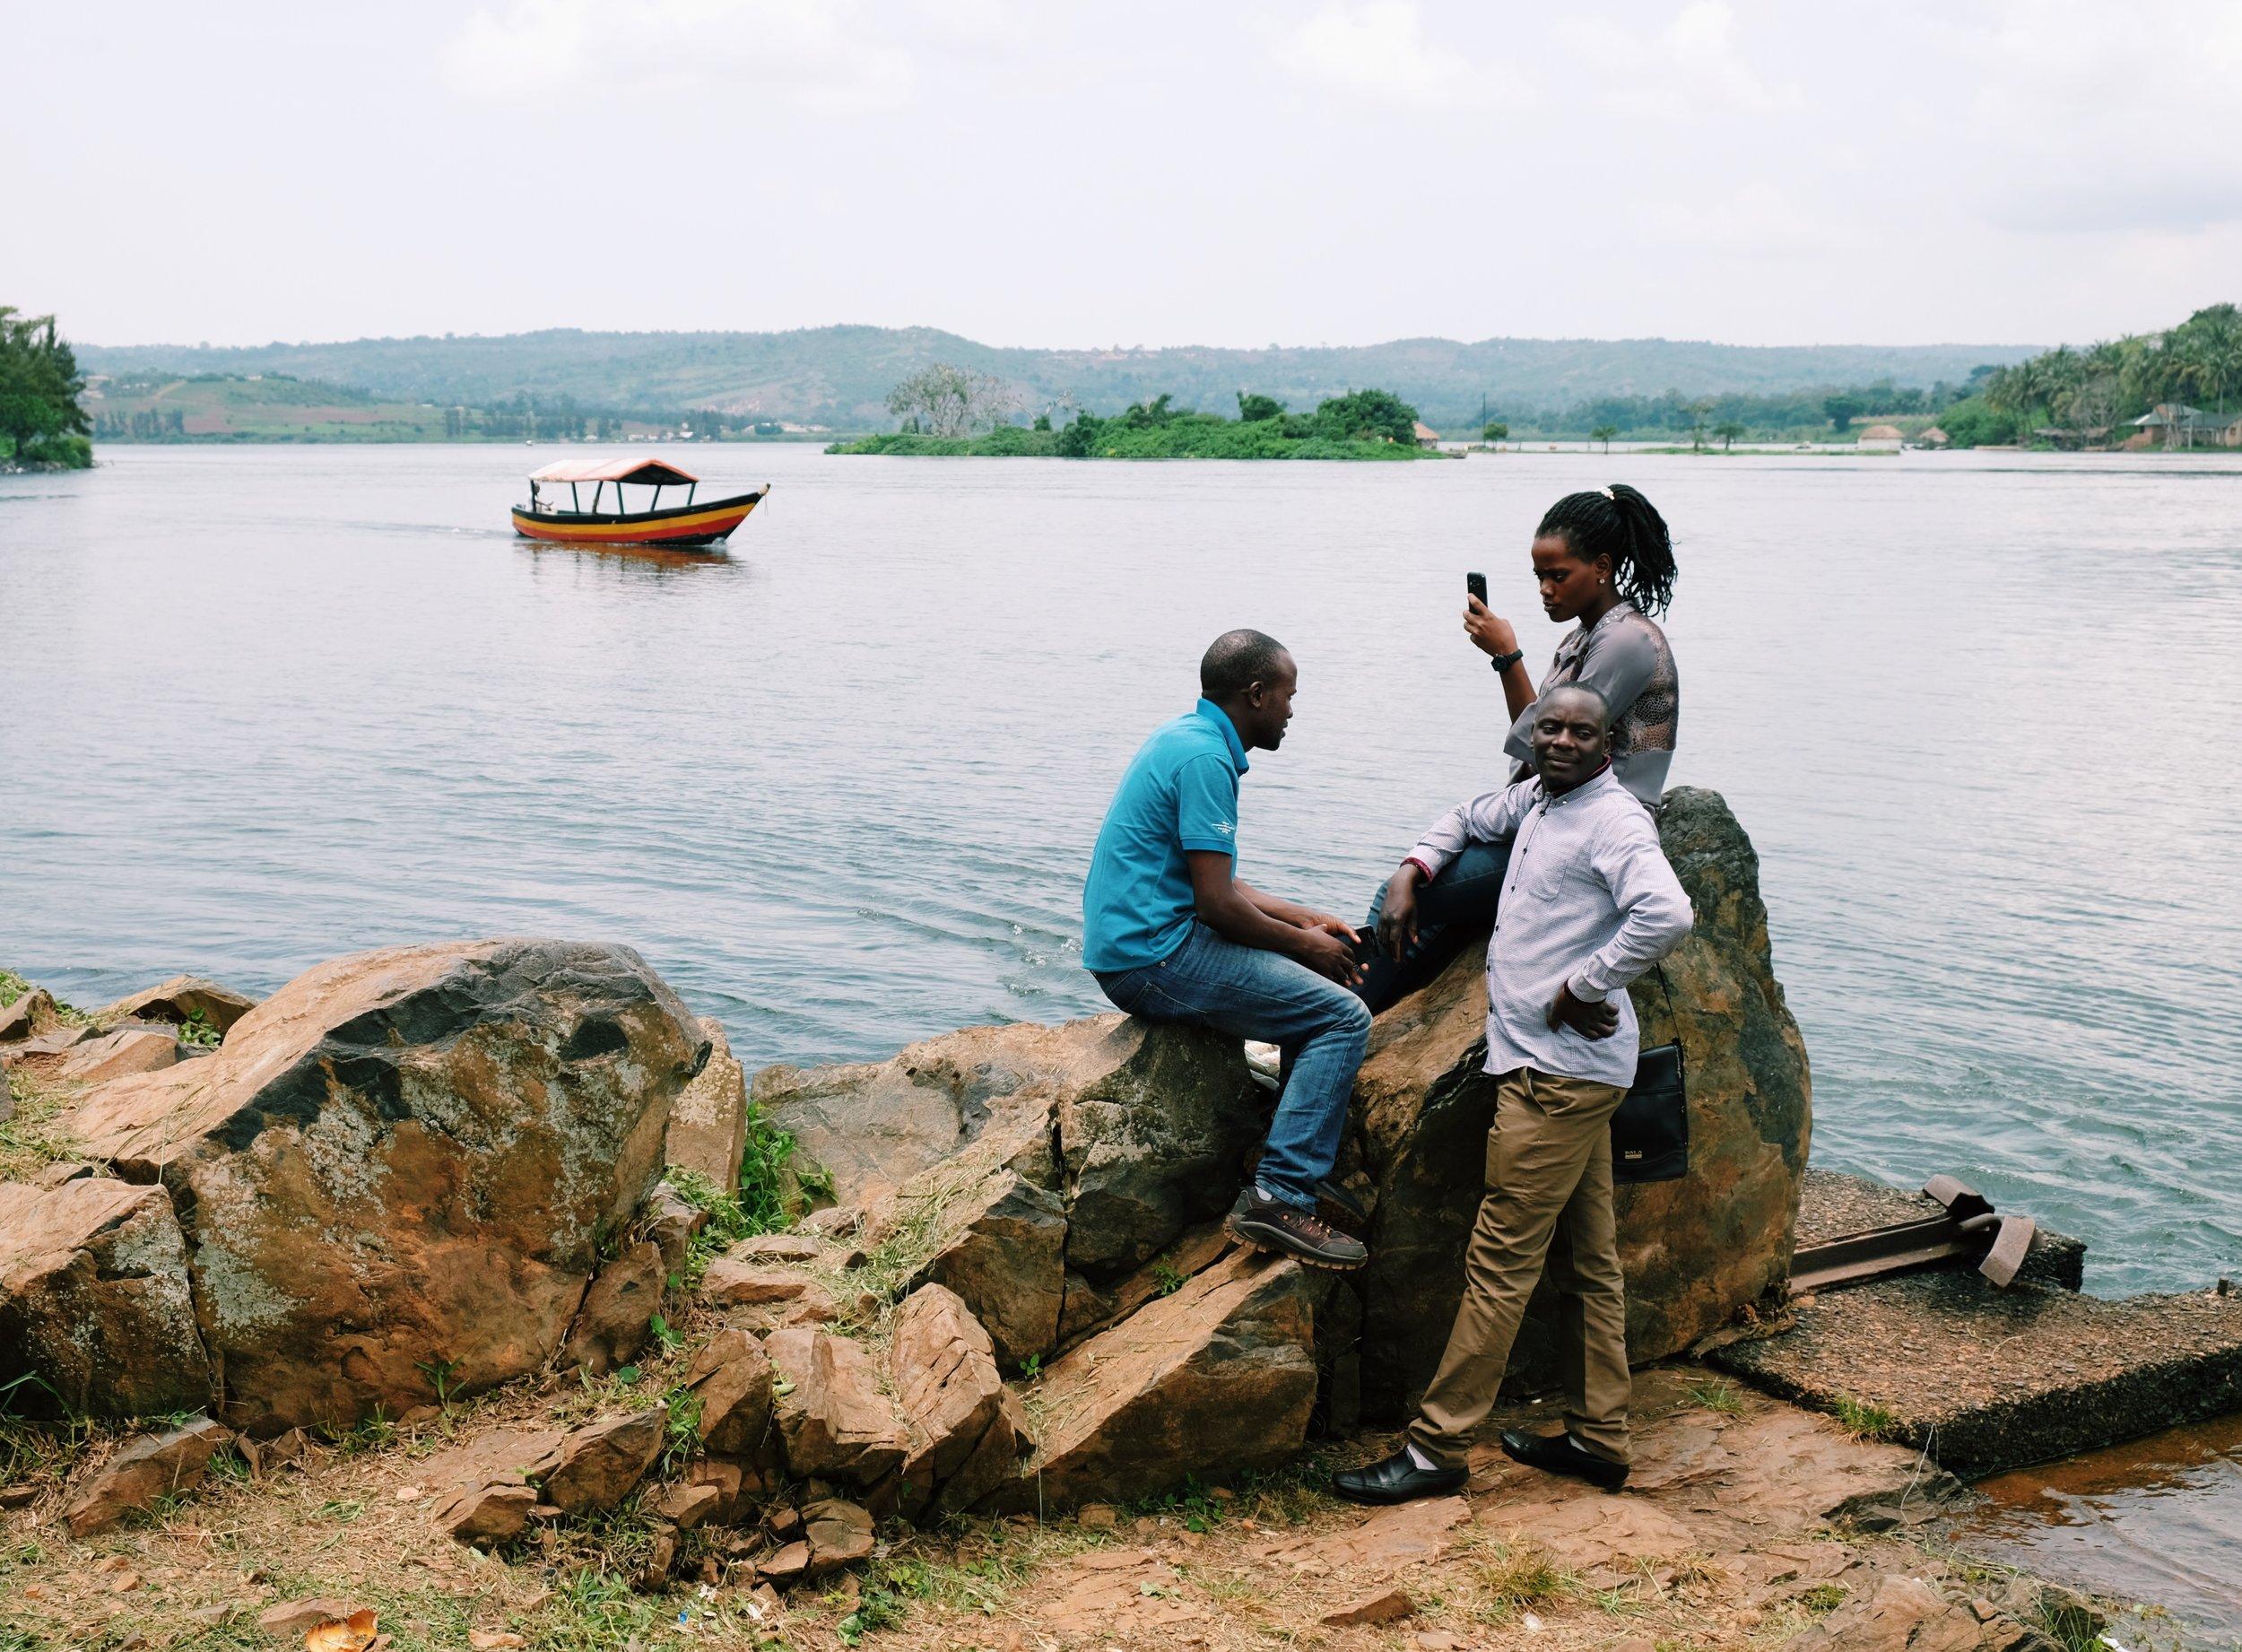 Visit Nile River Springs at Jinja, Uganda by Joost Bastmeijer.jpeg